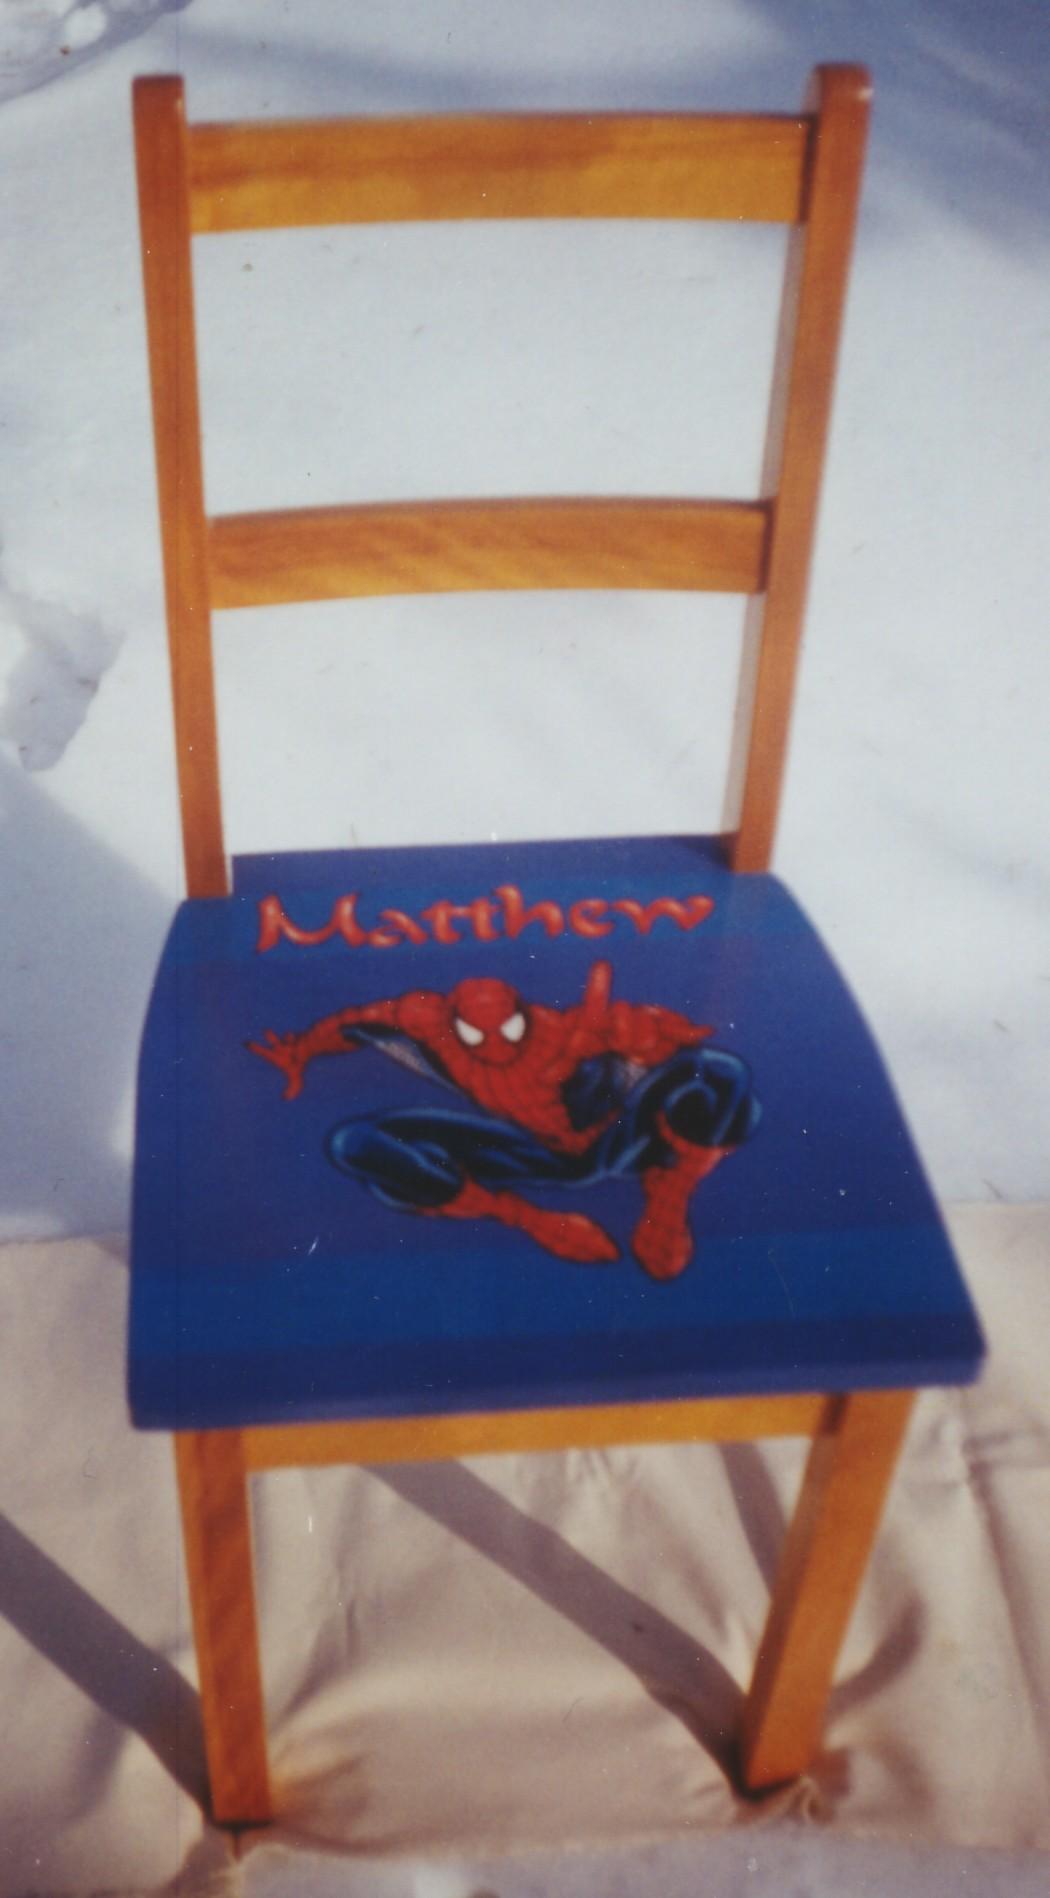 Murals By Marg Hand Painted Furniture  Matthew's Chair.jpg